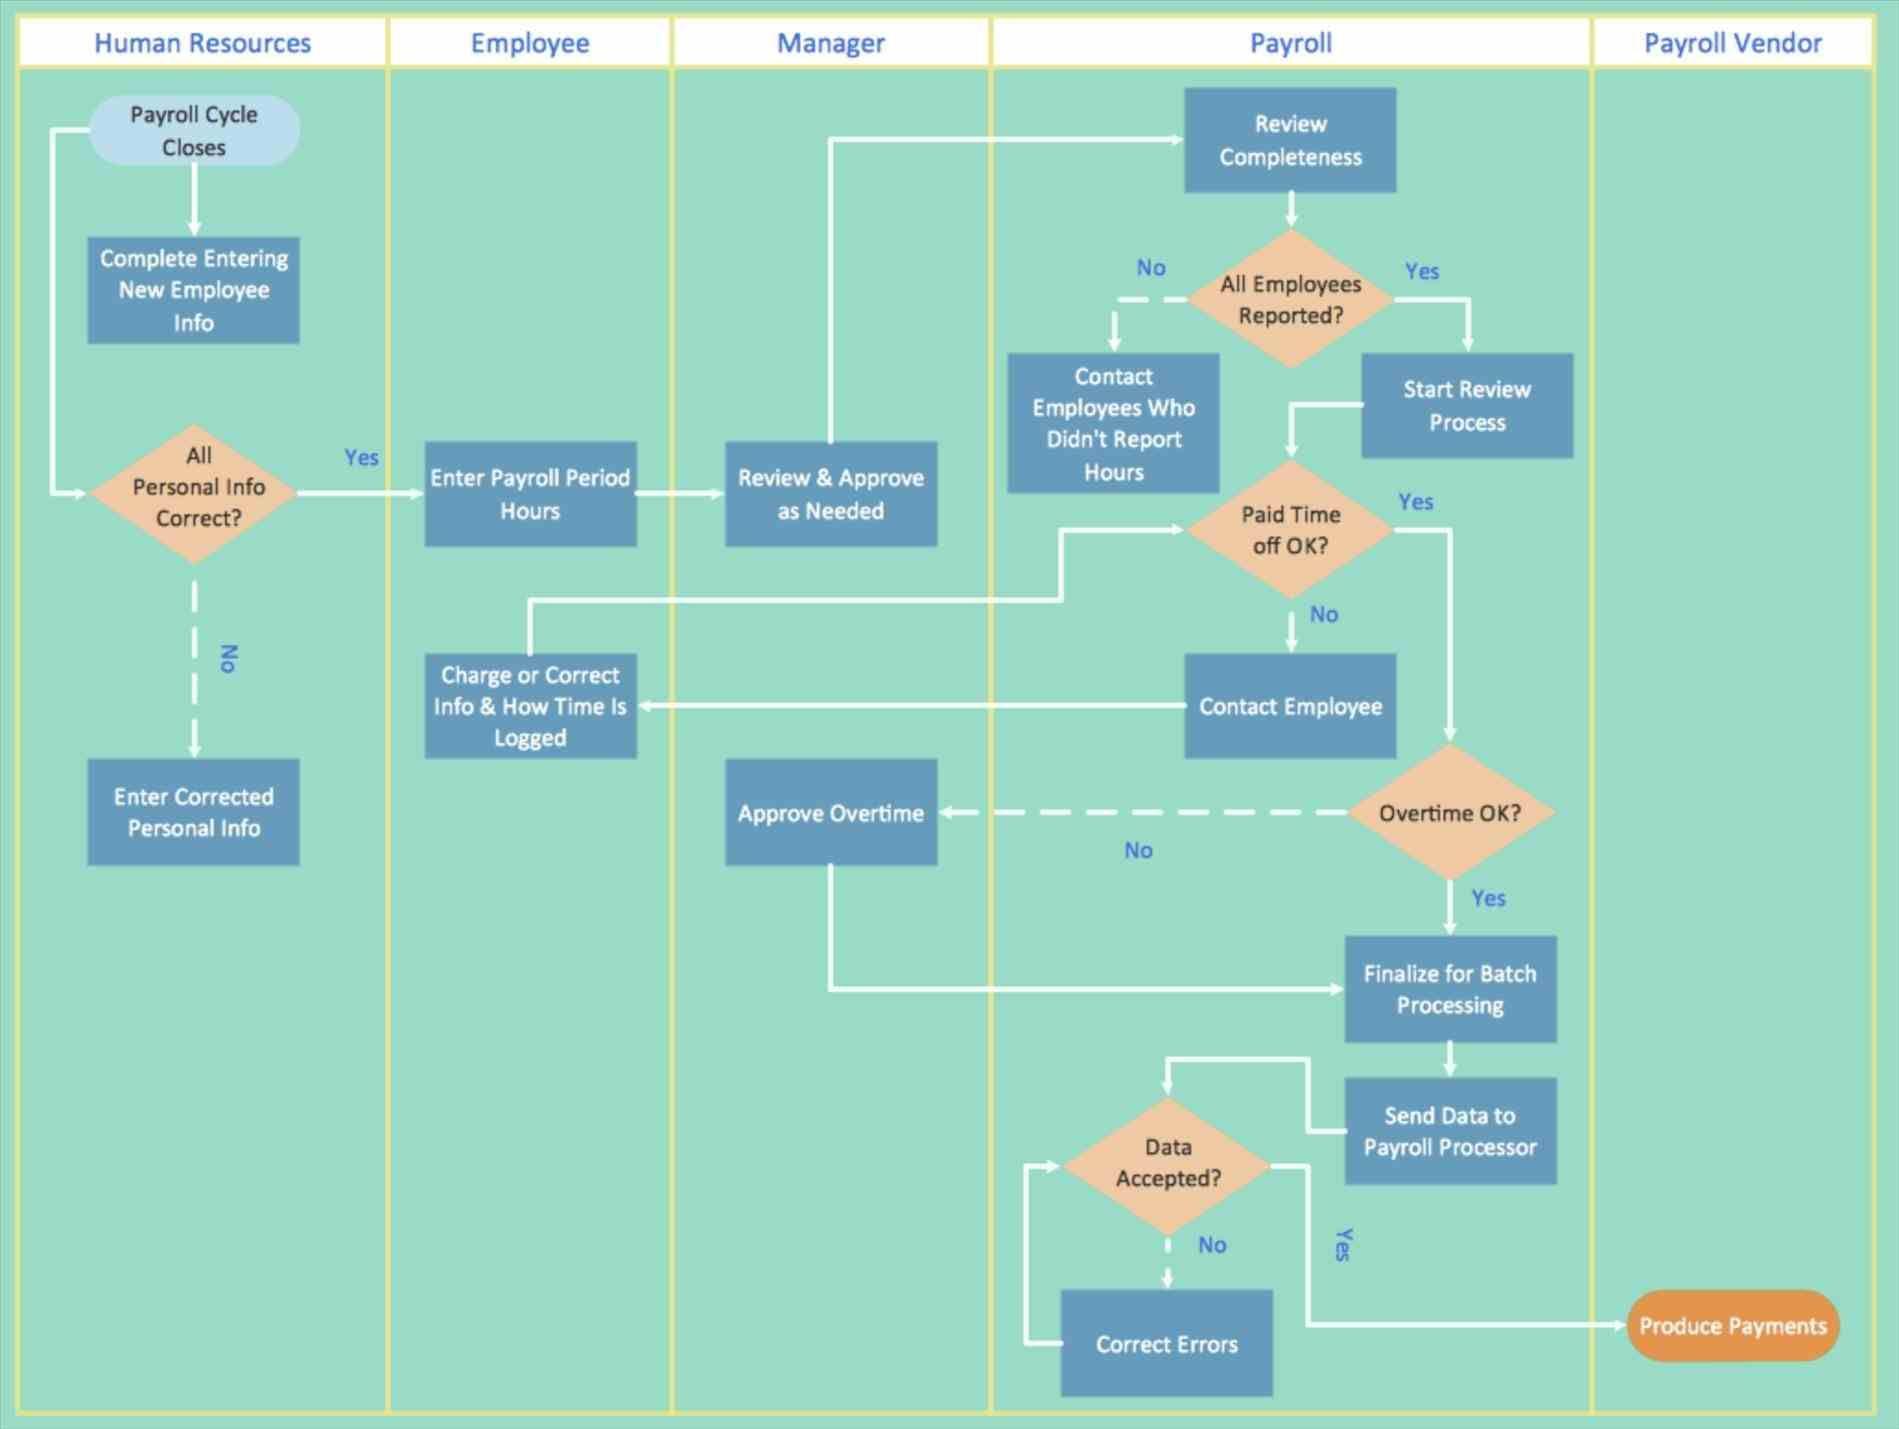 medium resolution of swim swimlane flowchart template excel lane flowchart symbols warehouse flow chart example workflow diagram process warehouse swimlane flowchart template